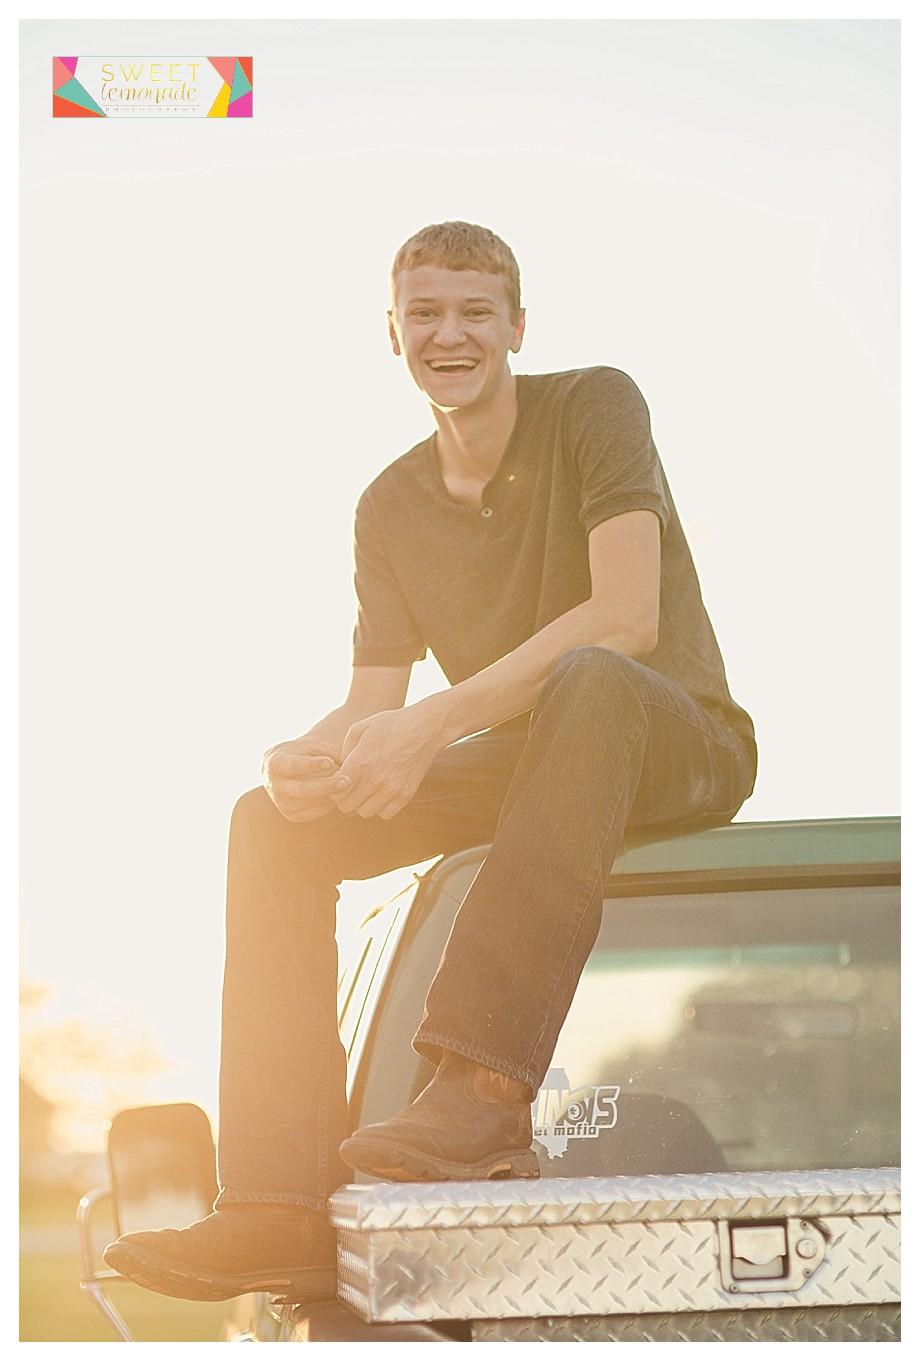 Case-FFA-Boys-Senior-Photo-Session-Tuscola-Mahomet-Illinois-Sweet-Lemonade-Photography_0454